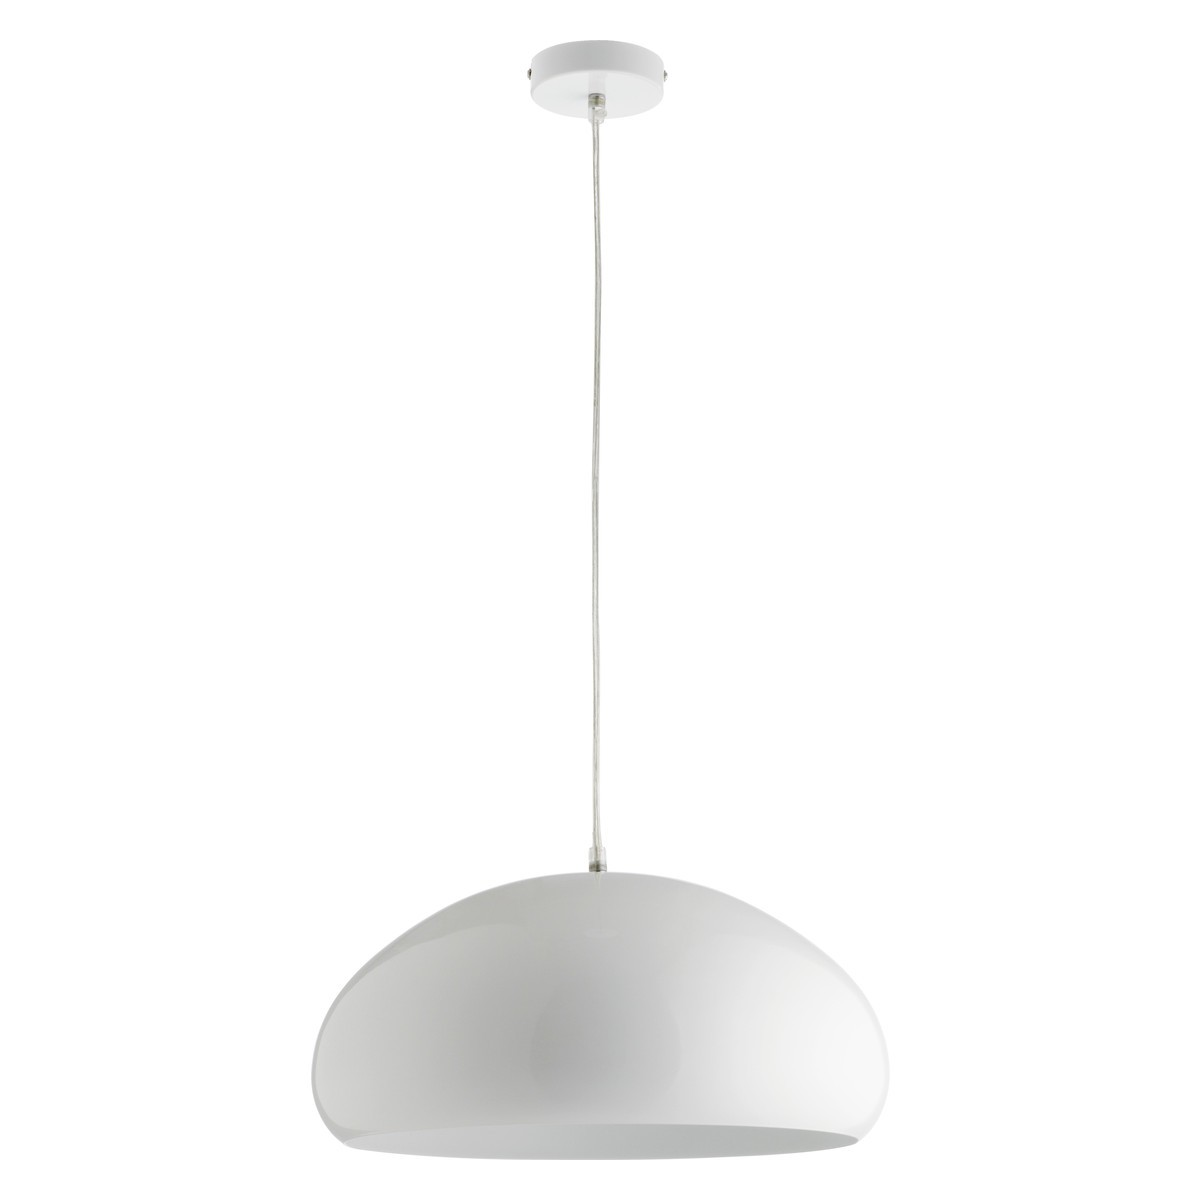 10 Advantages Of White Ceiling Pendant Light